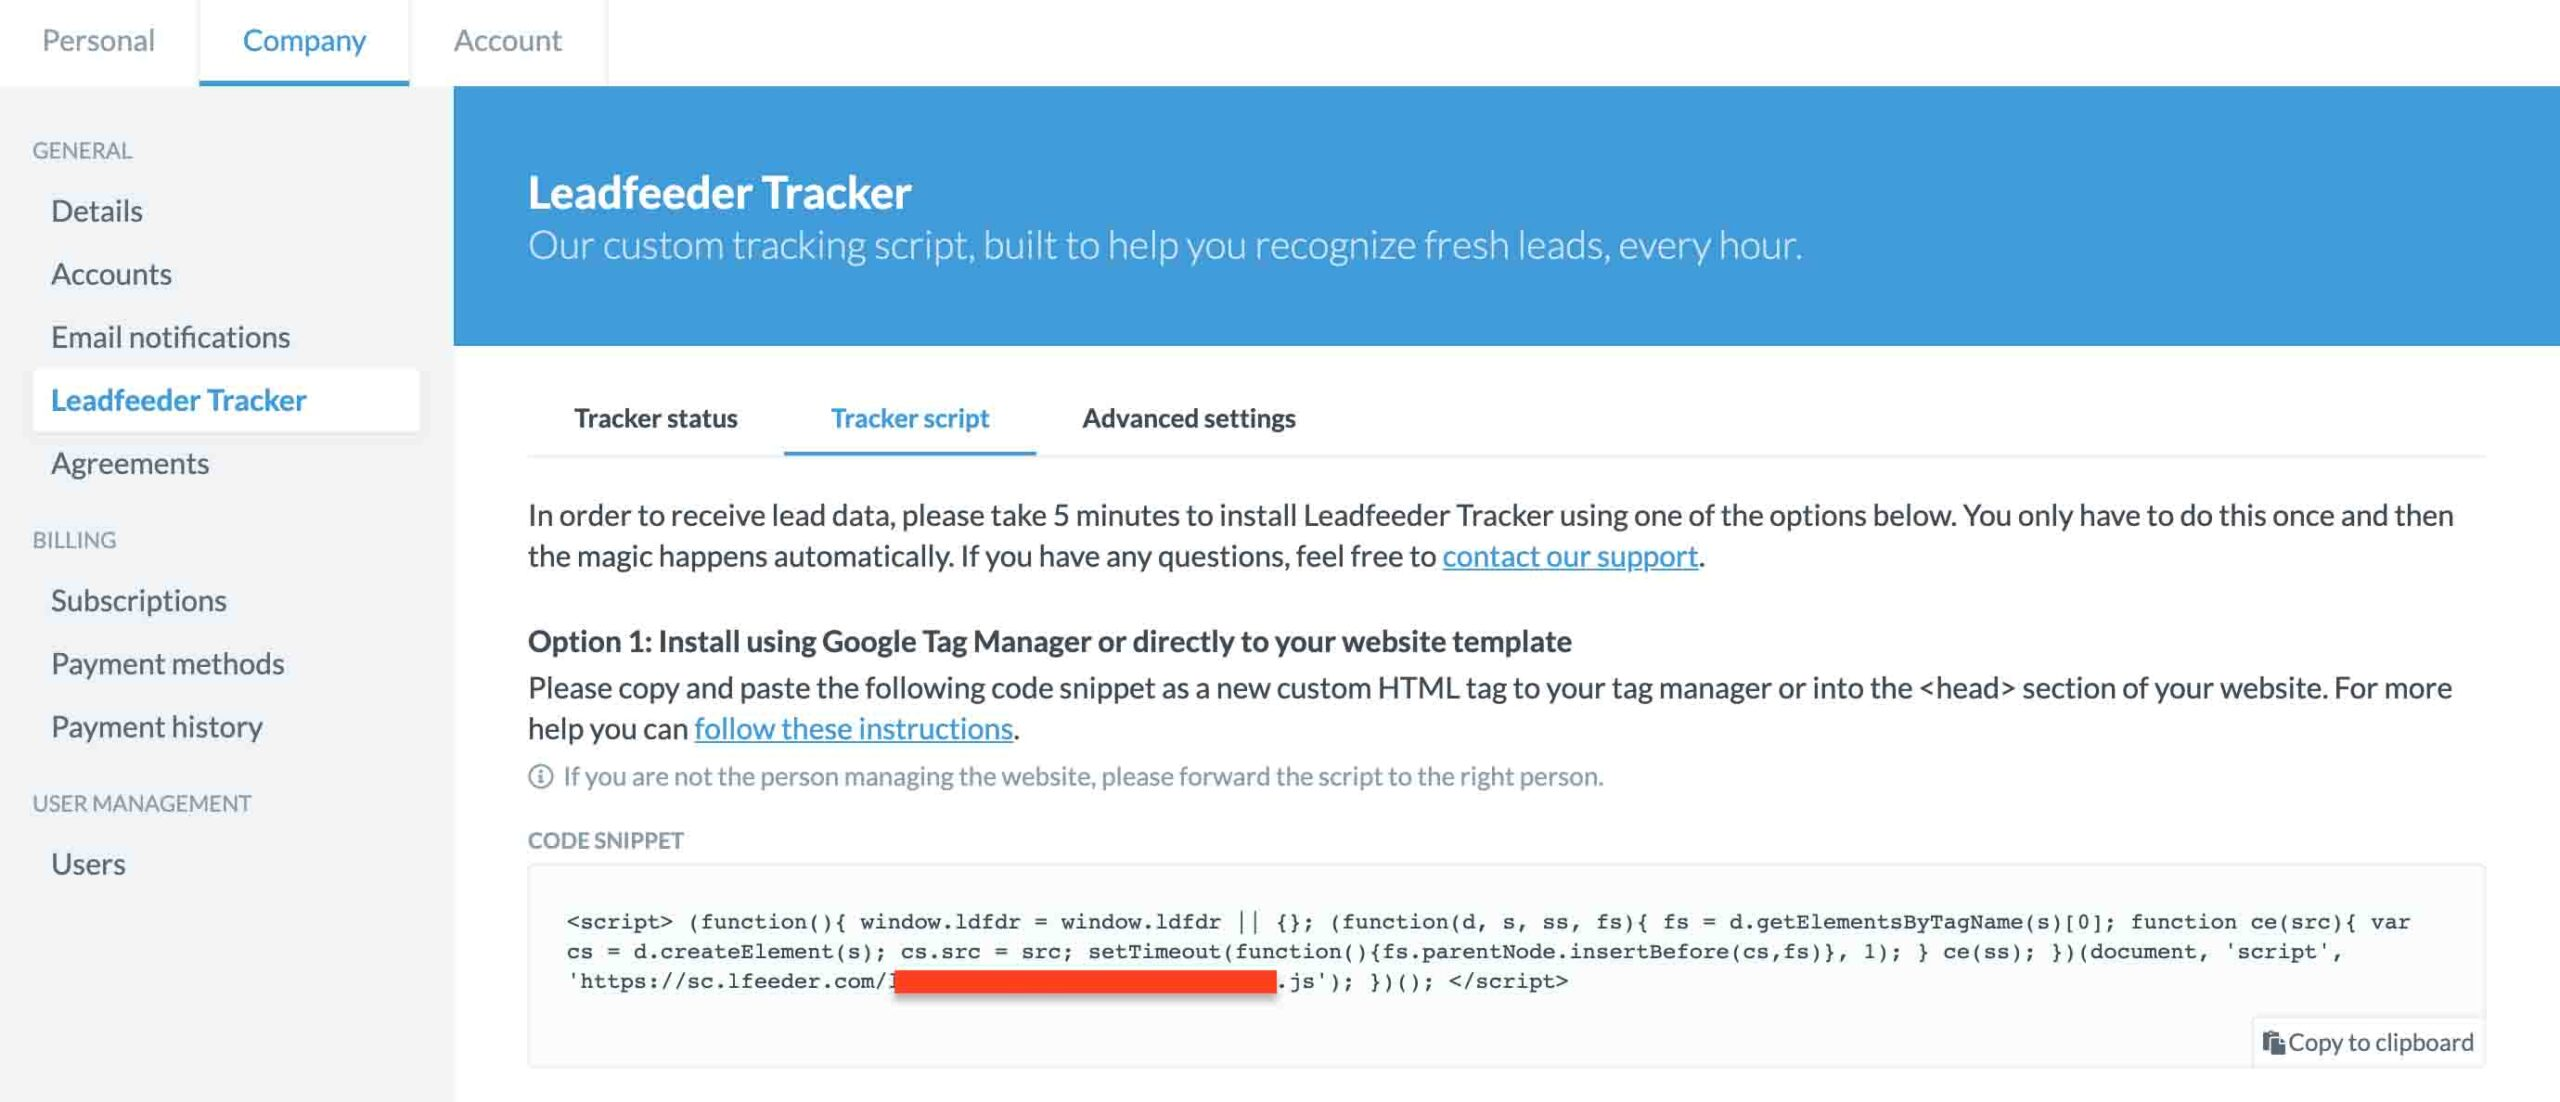 Leadfeeder-Tracker-Script-scaled